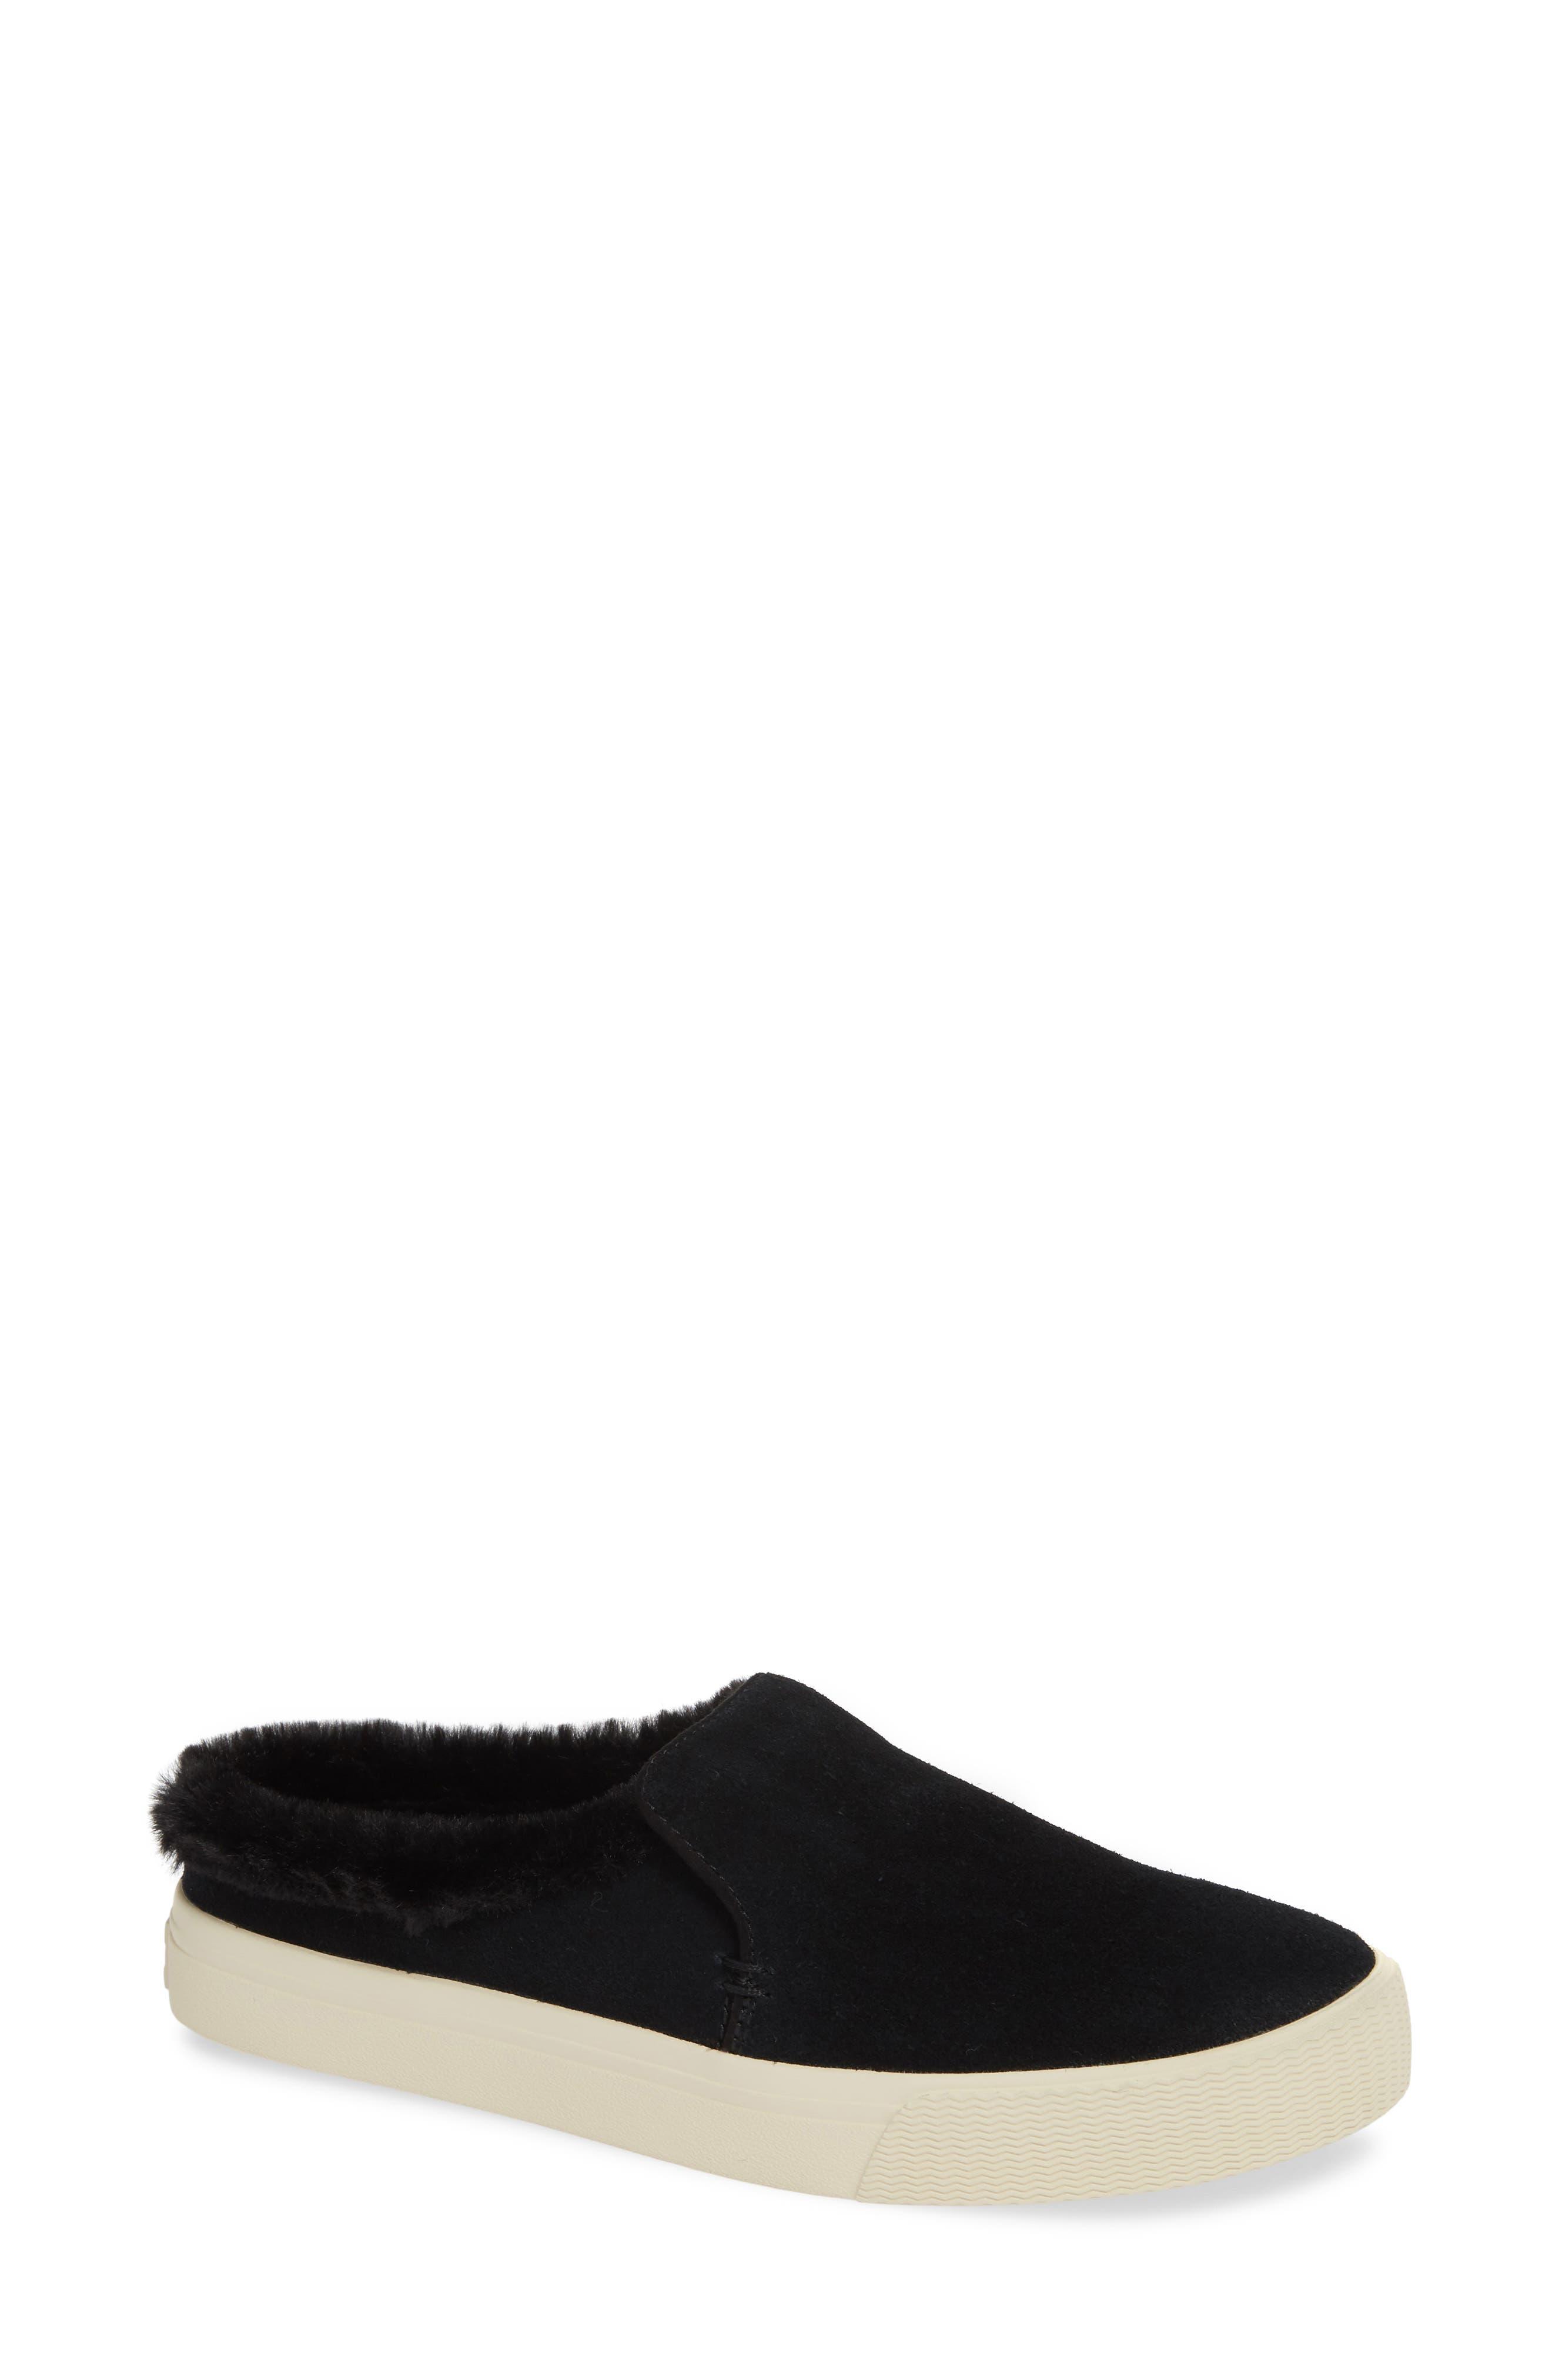 TOMS, Sunrise Faux Fur Lined Slip-On Sneaker, Main thumbnail 1, color, BLACK SUEDE